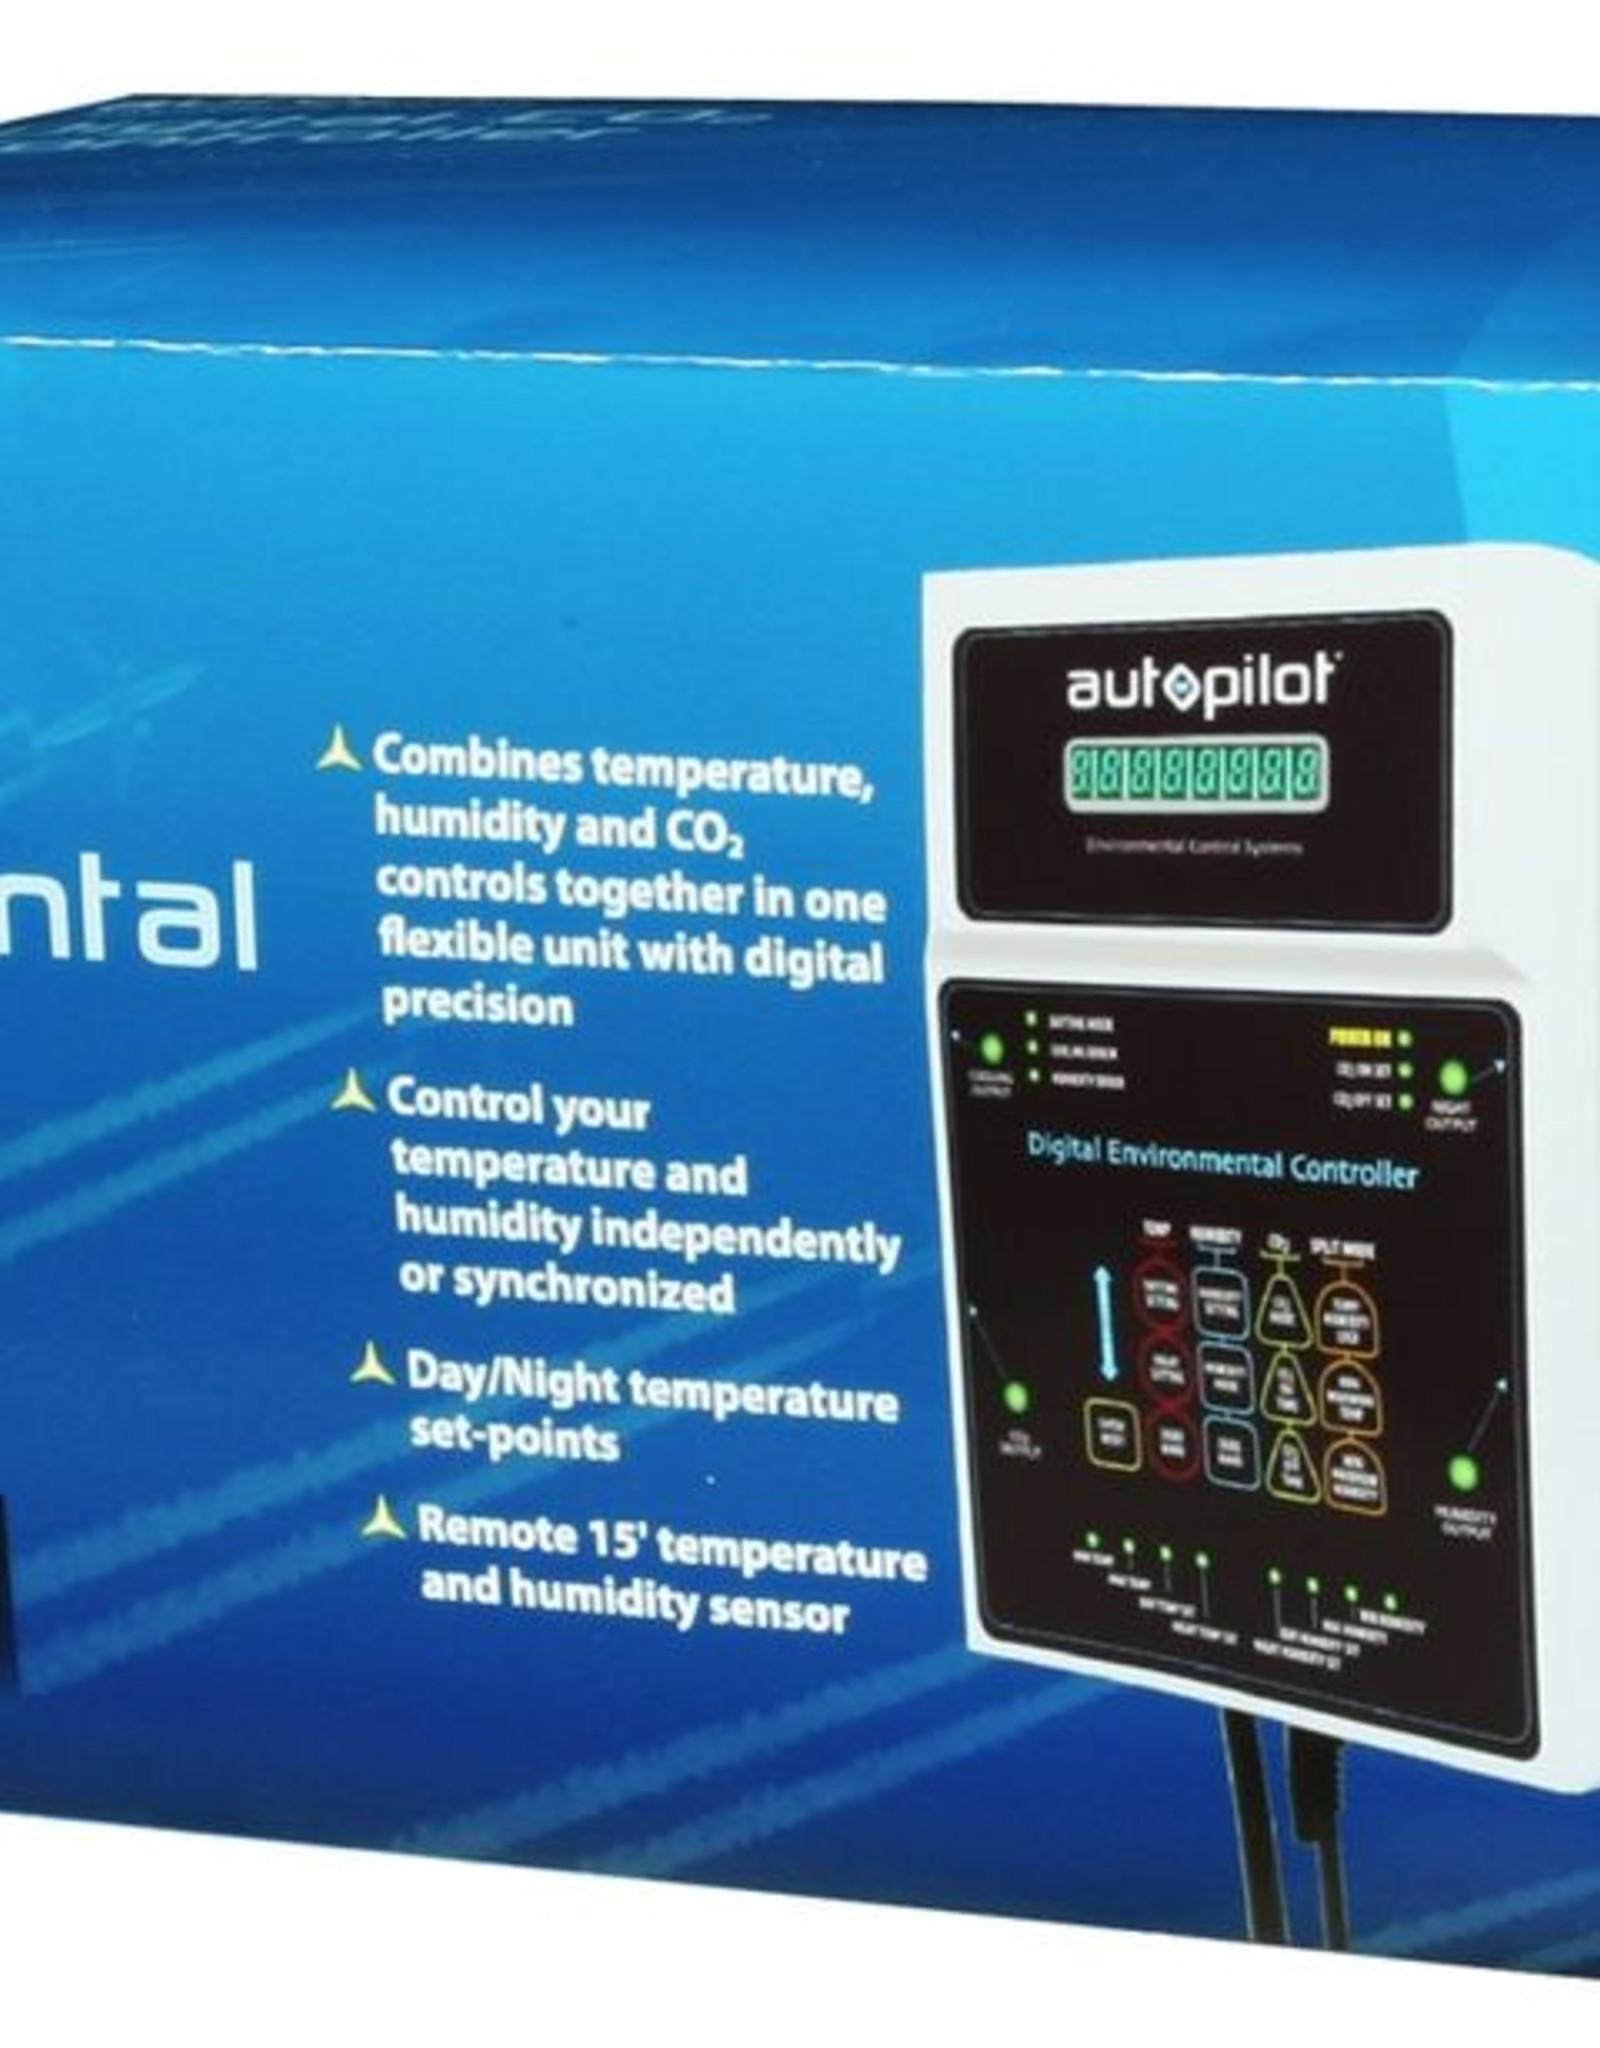 AUTOPILOT Digital Environmental Controller